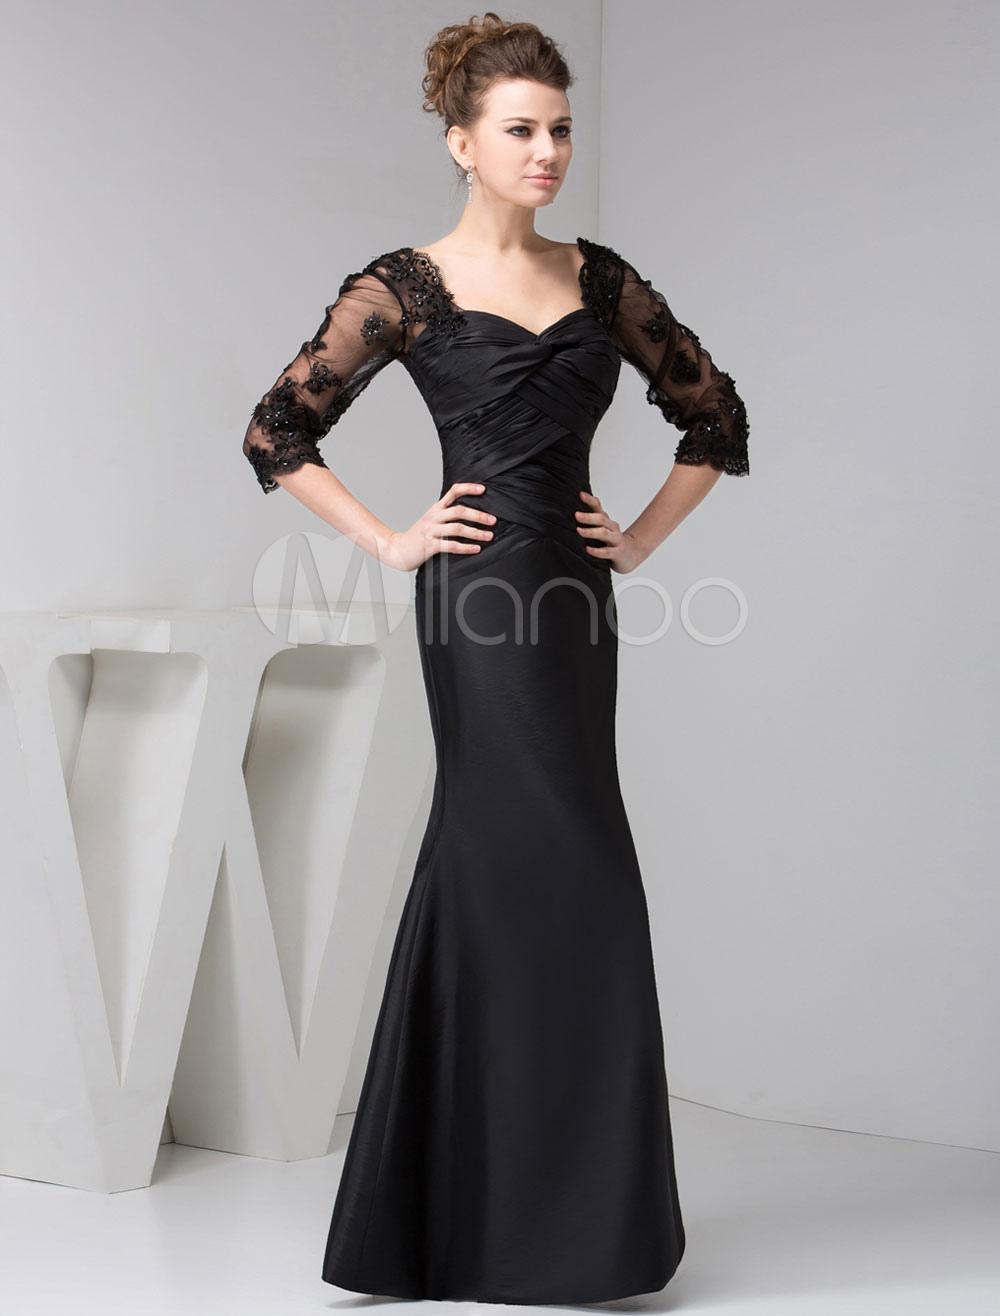 Black Mother Of Bride Dress Long Sleeves Lace Mermaid Maxi Evening Dress (Wedding) photo